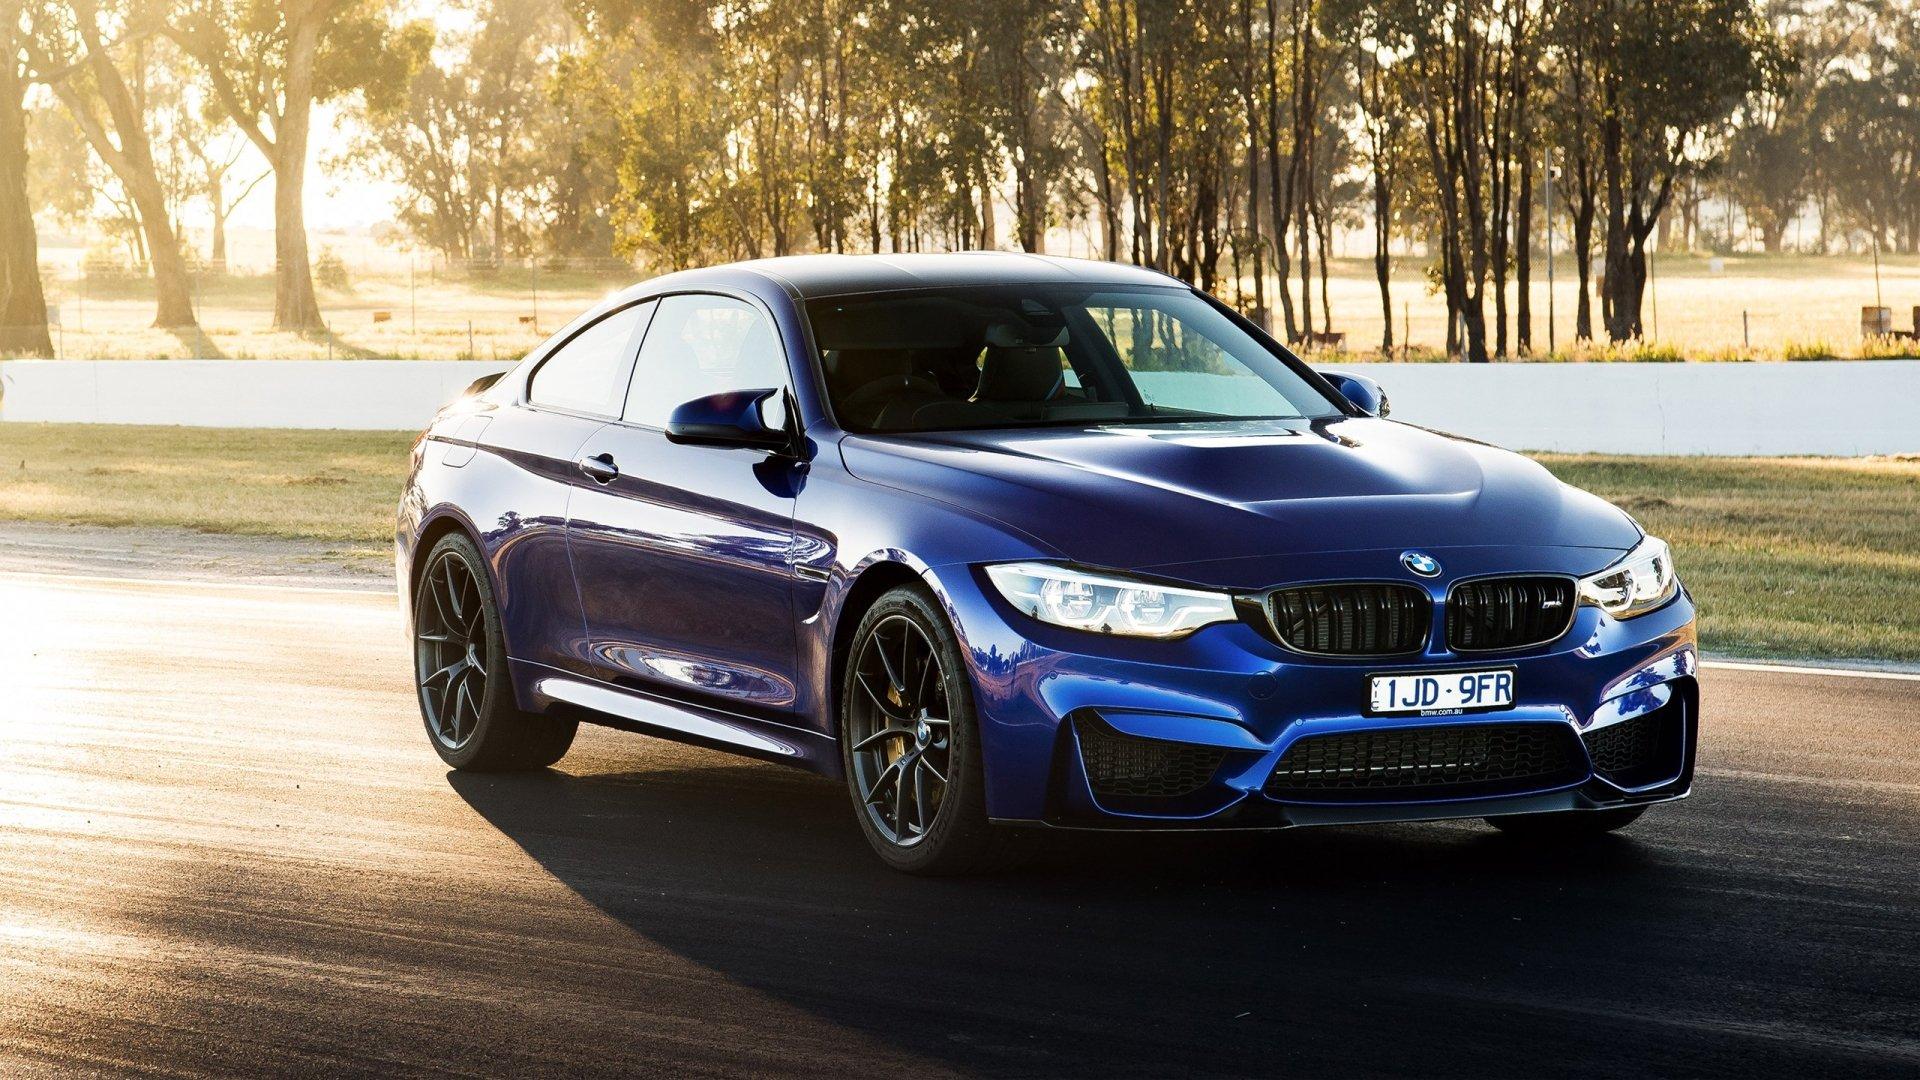 BMW M4 HD Wallpaper | Background Image | 2560x1440 | ID ...